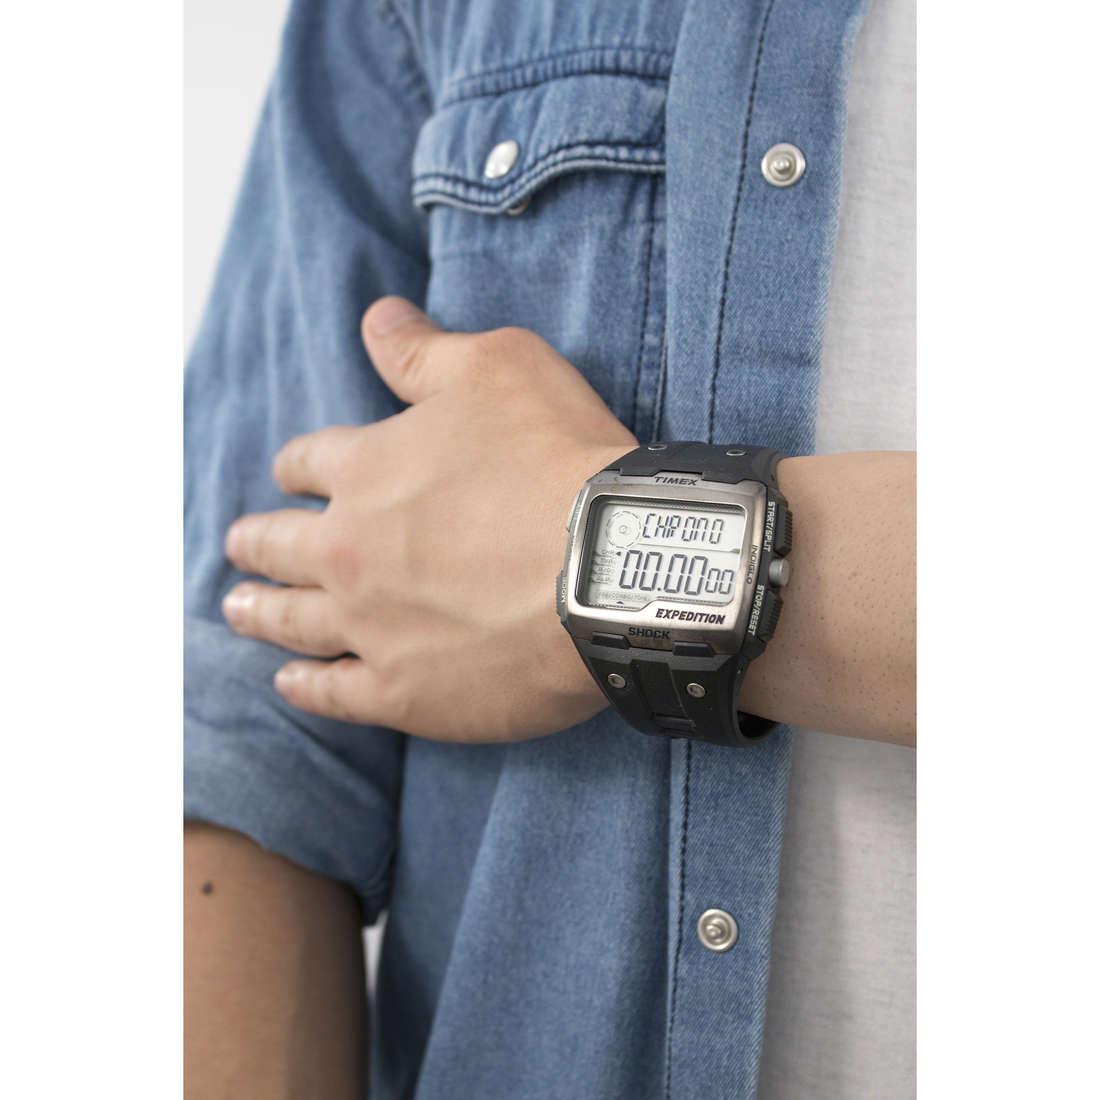 Timex digitali Grid Shock uomo TW4B02500 indosso